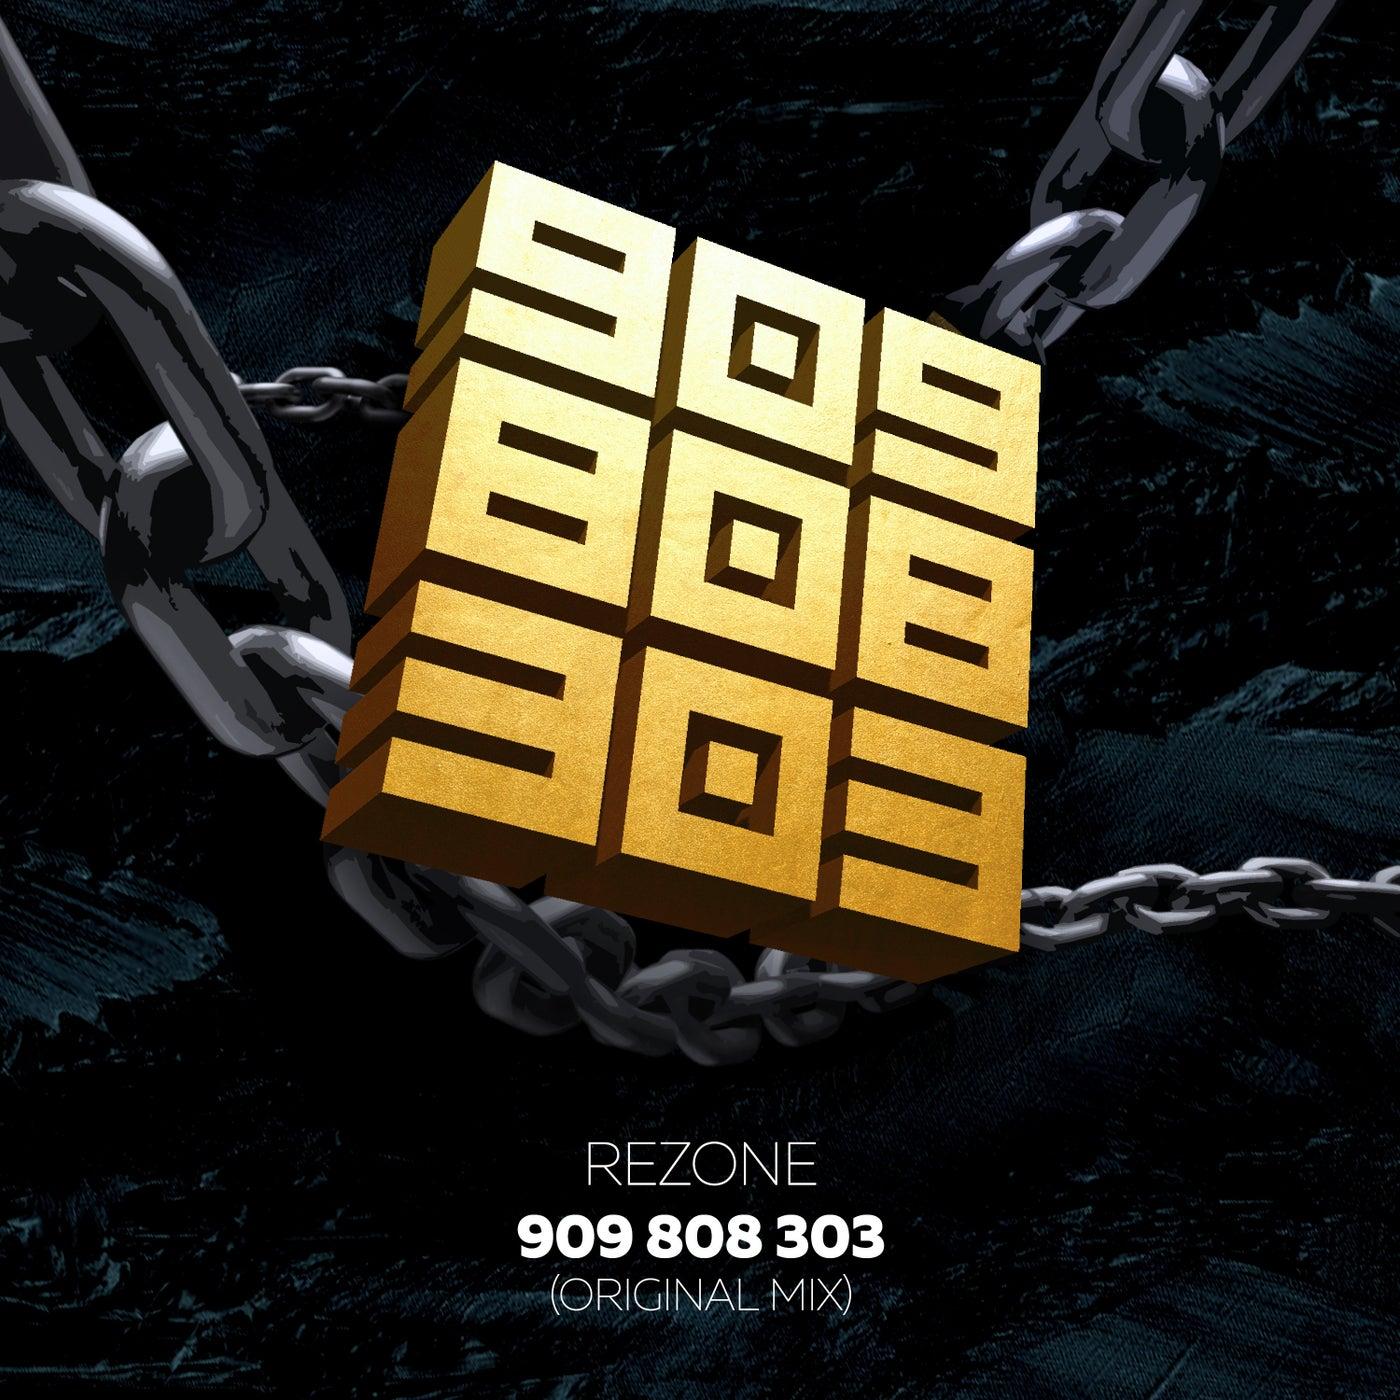 909 808 303 (Original Mix)